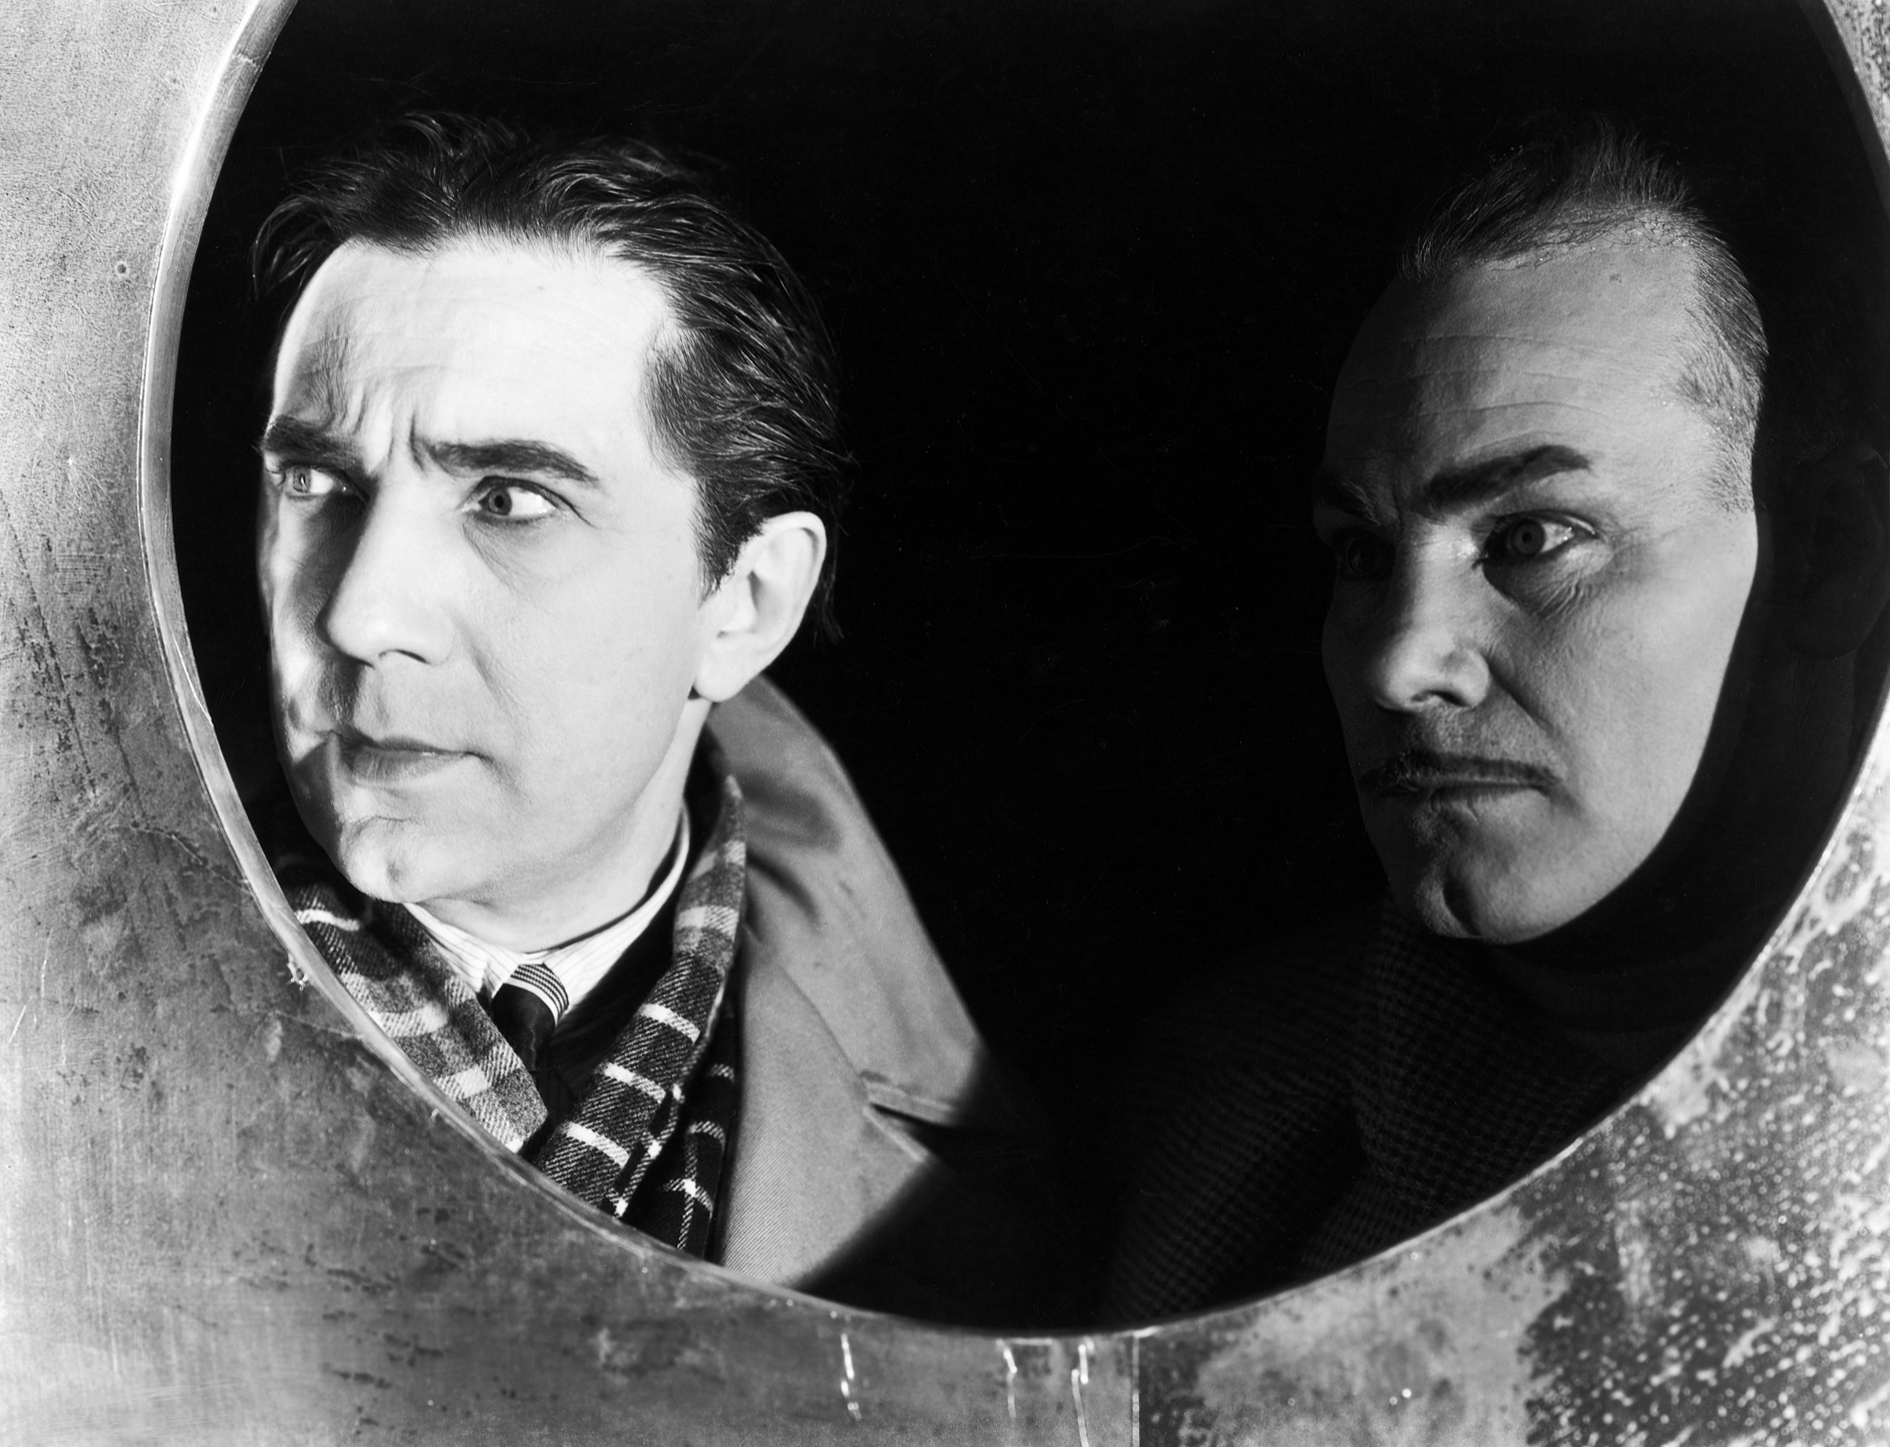 Bela Lugosi With Harry Cording (R)